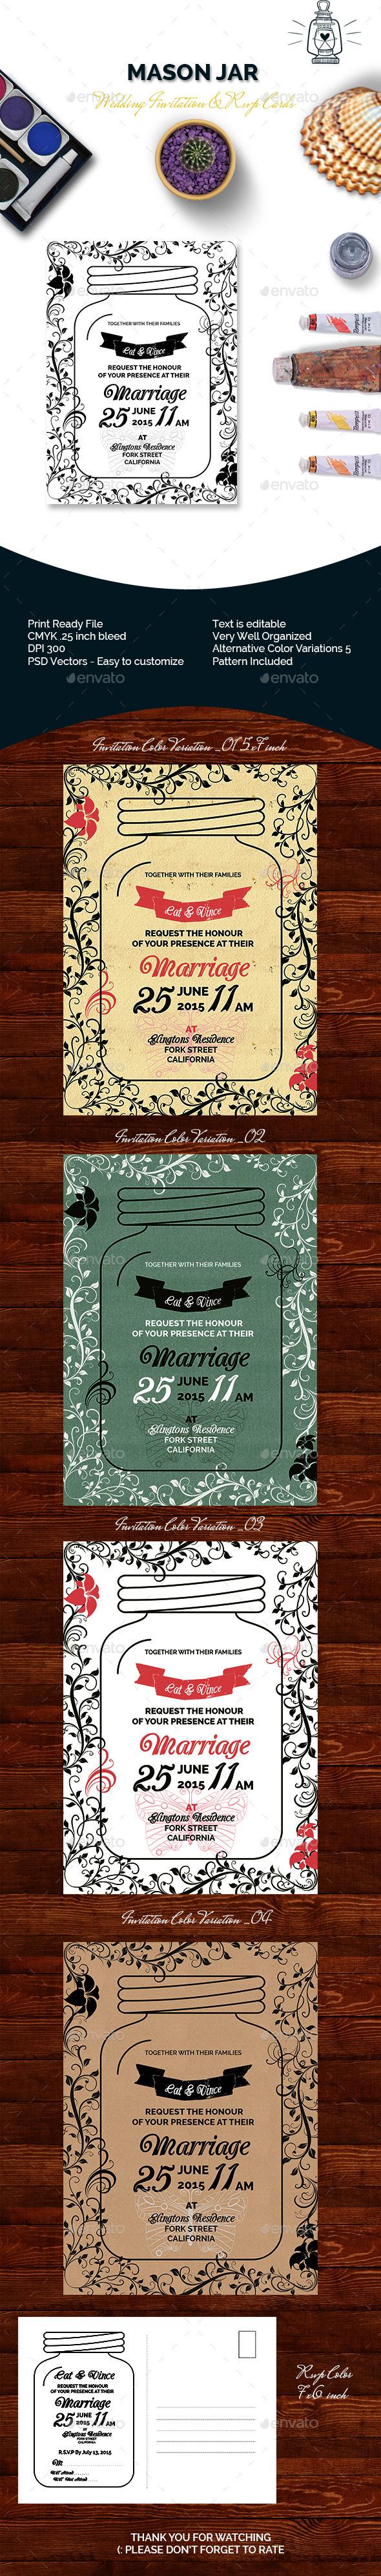 Mason Jar Wedding Invitation & RSVP